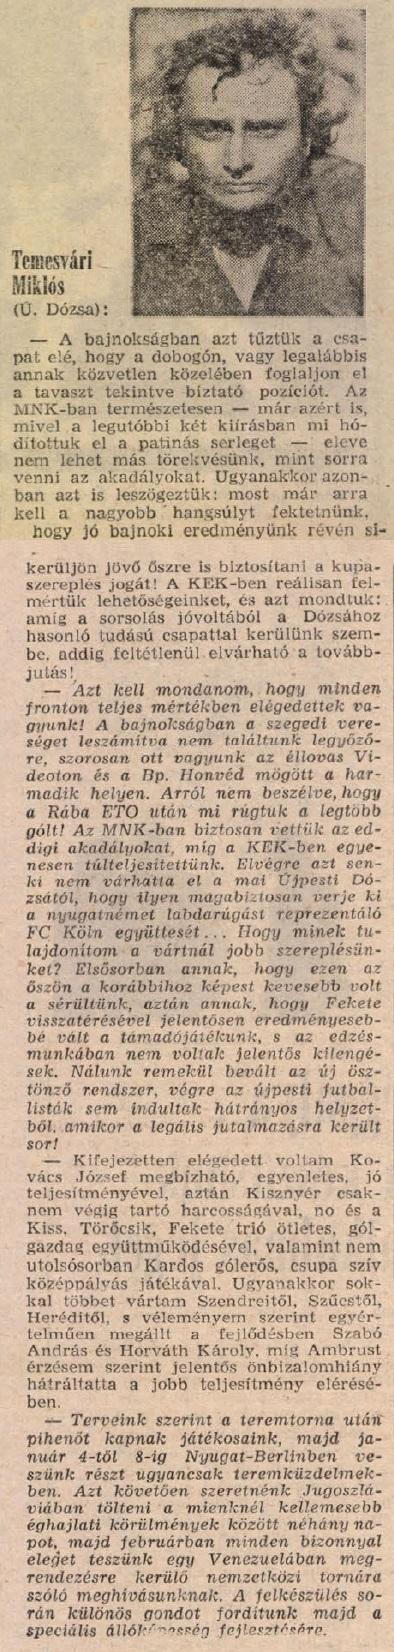 idokapszula_nb_i_1983_84_oszi_zaras_edzoi_gyorsmerleg_1_3_u_dozsa_temesvari_miklos.jpg